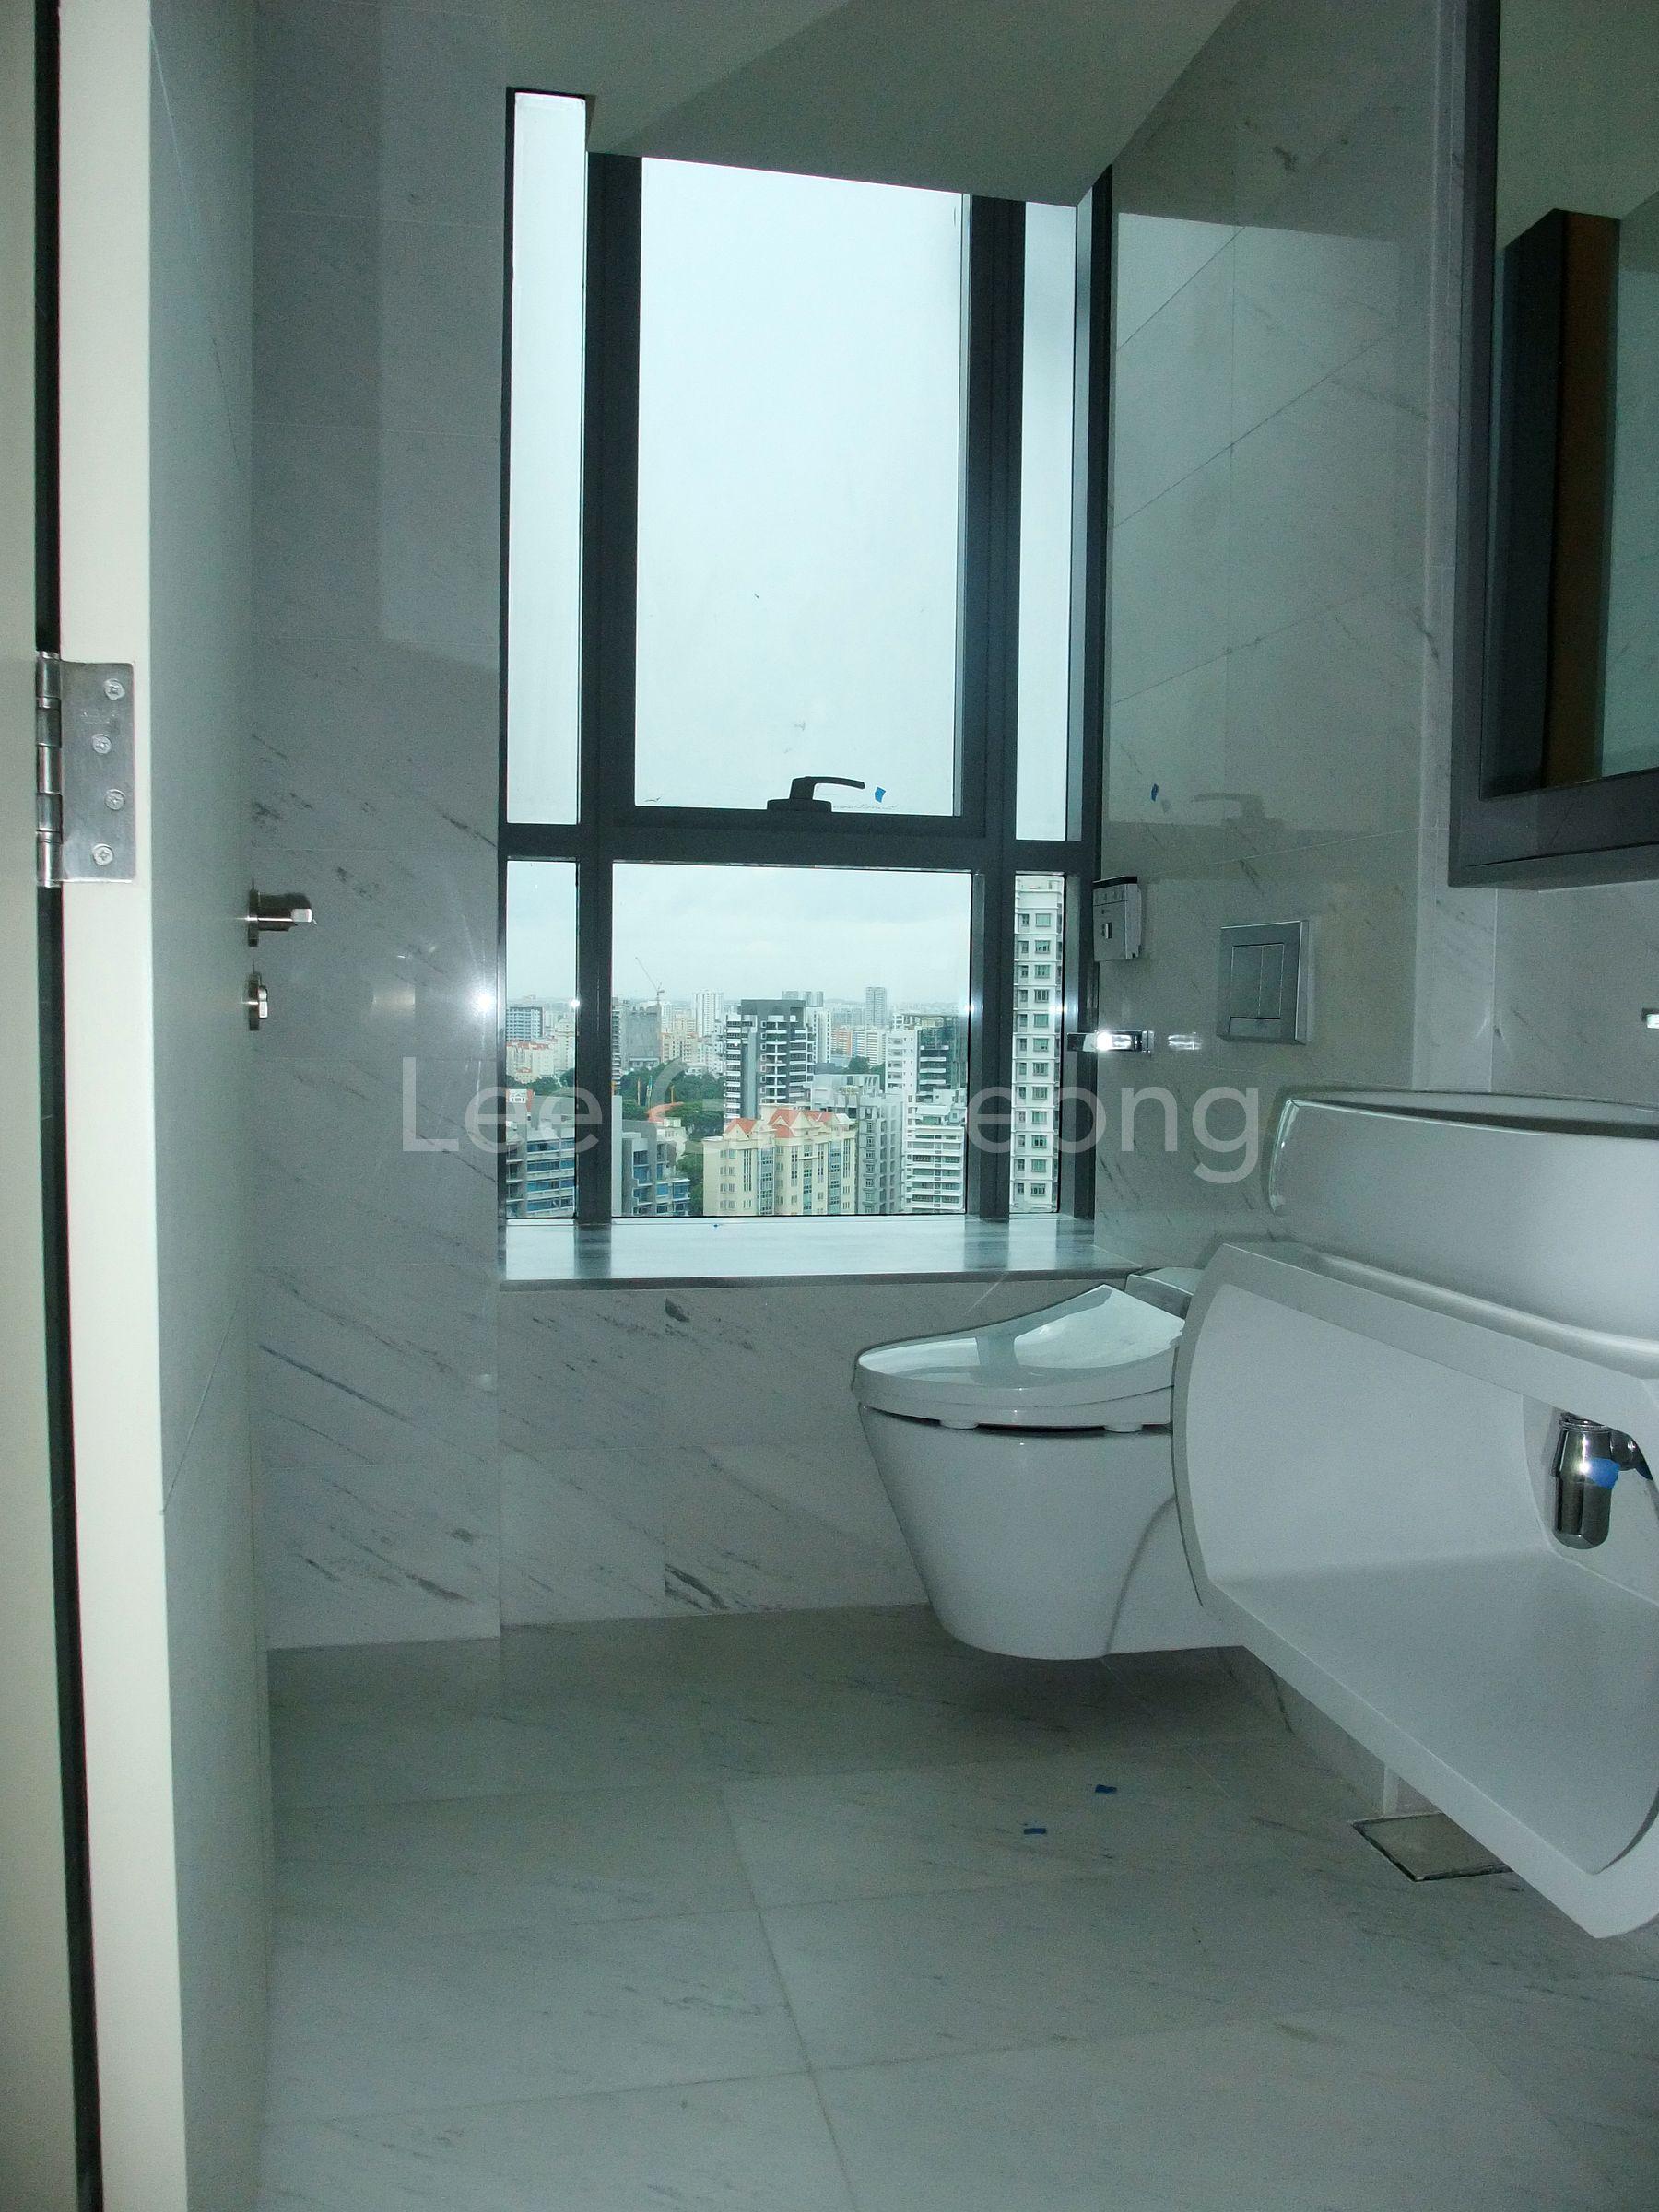 Master bathroom